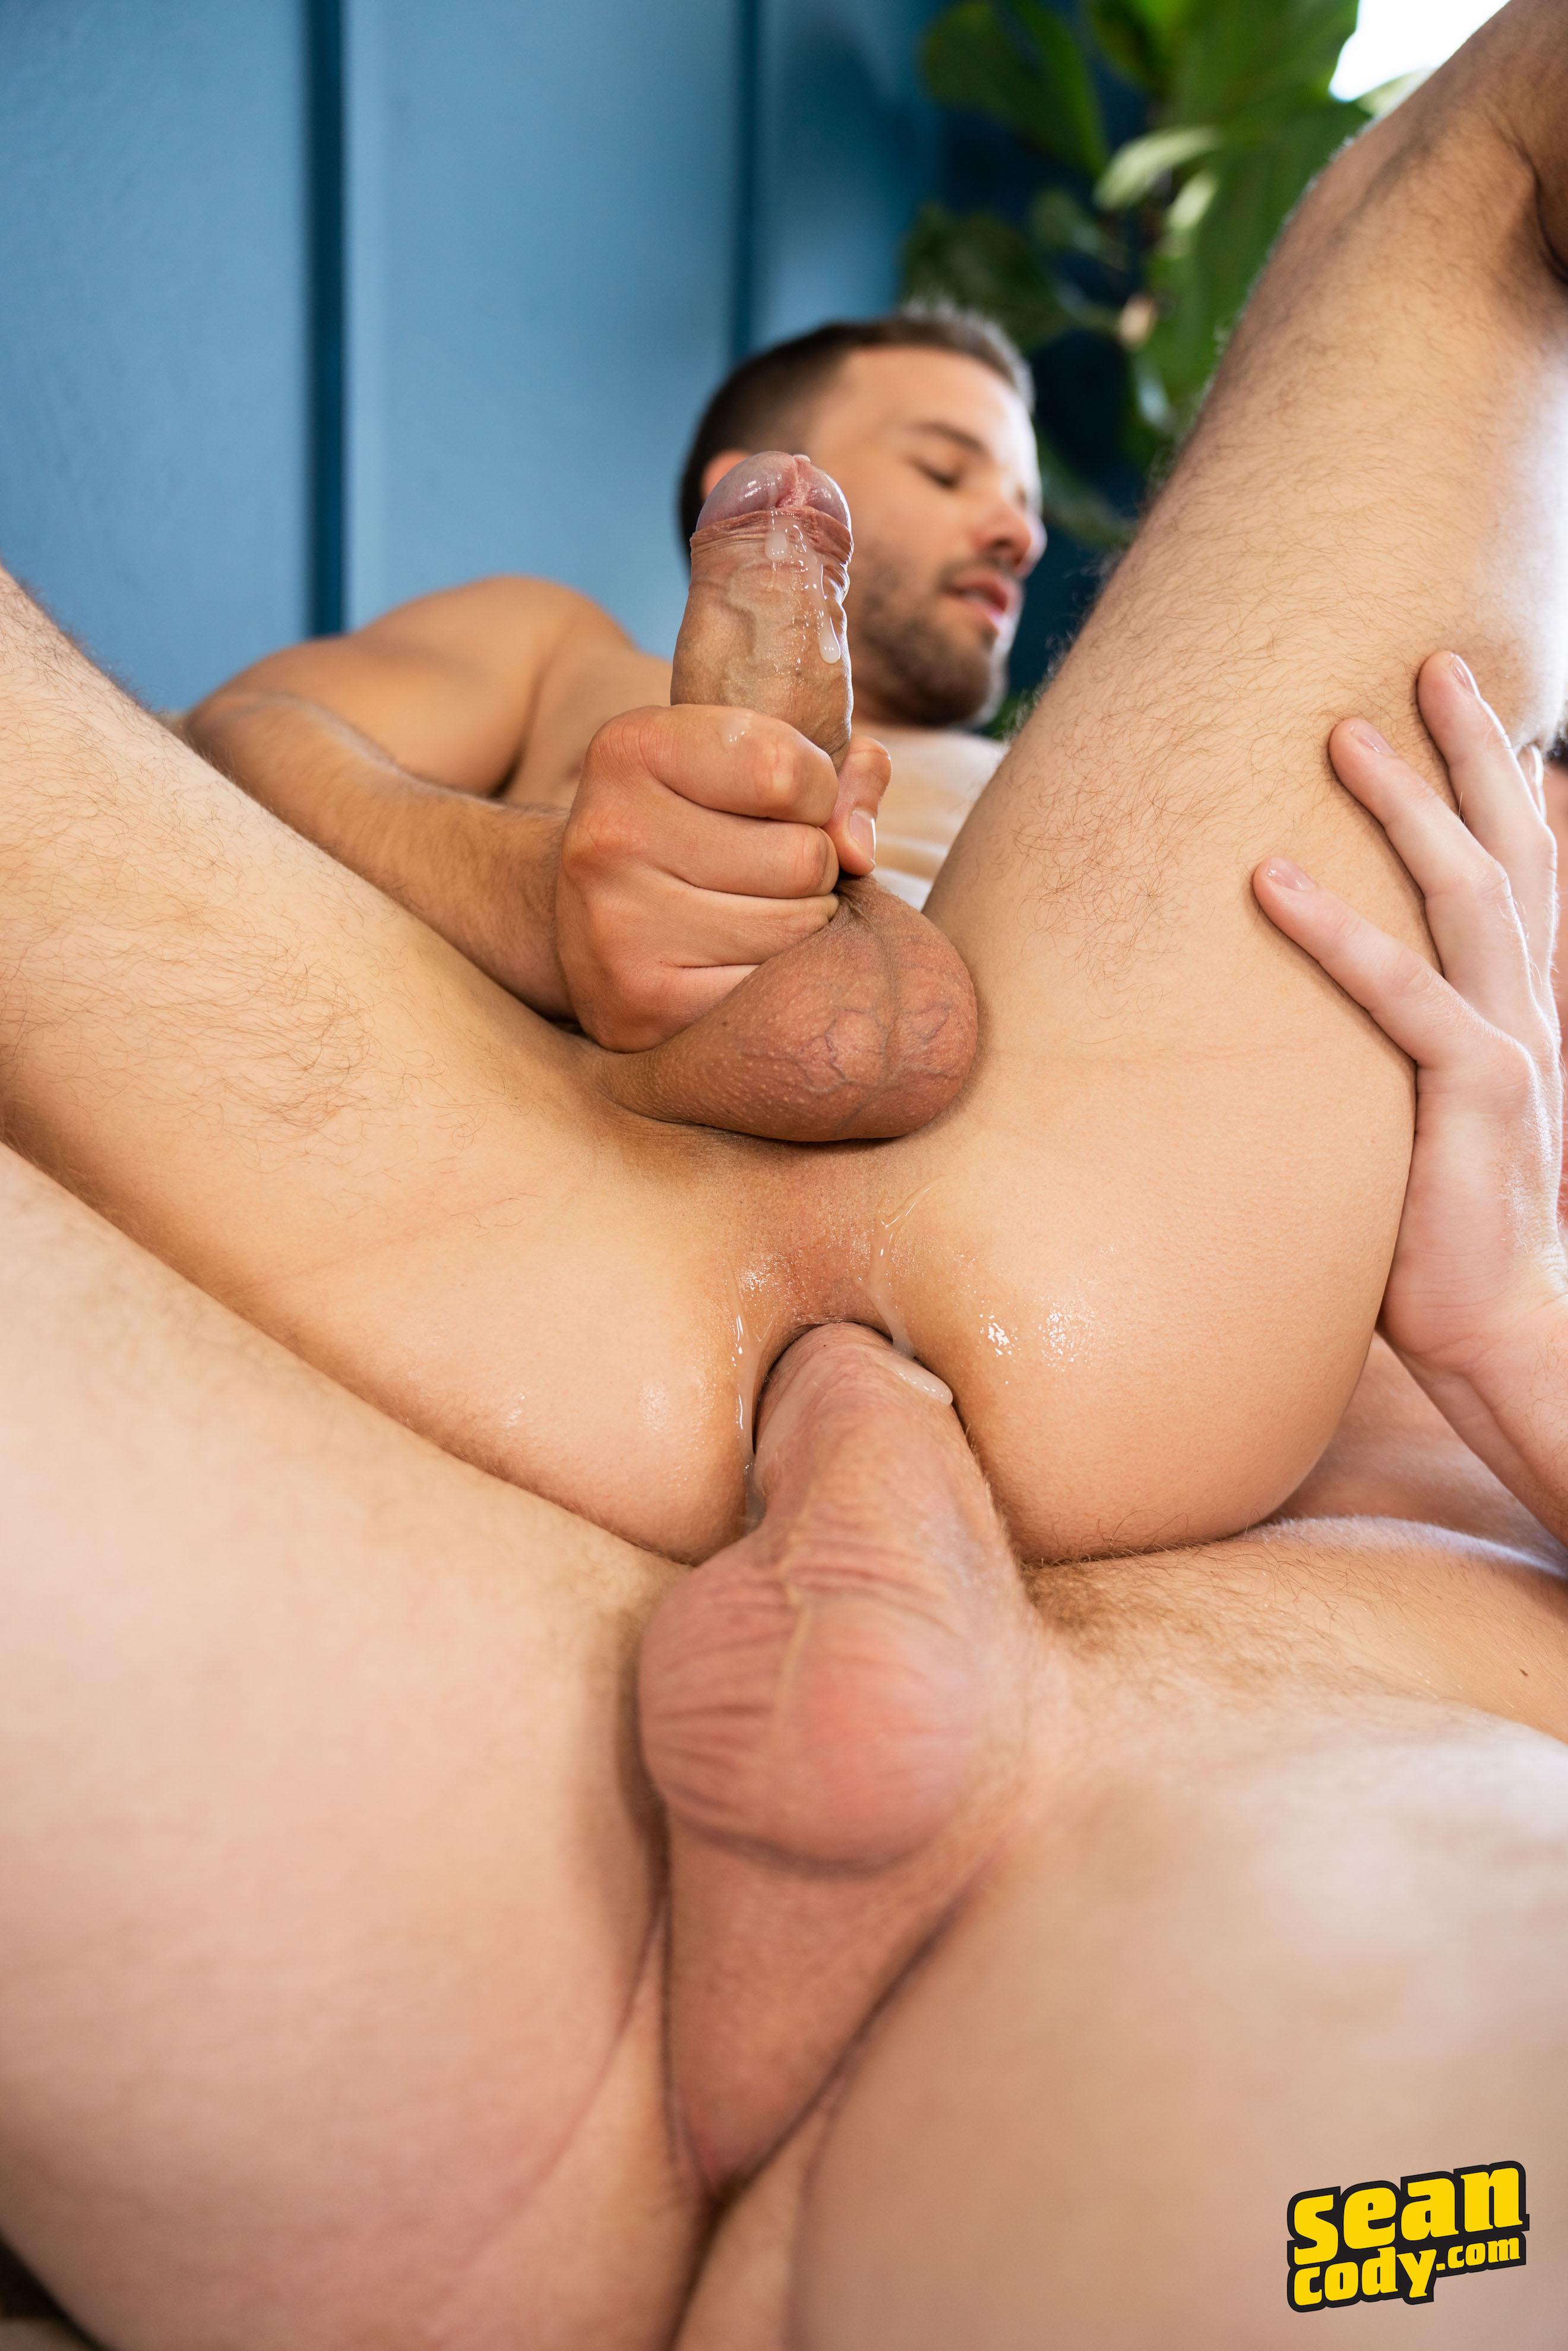 sean cody jax fucks jackson bareback gay porn